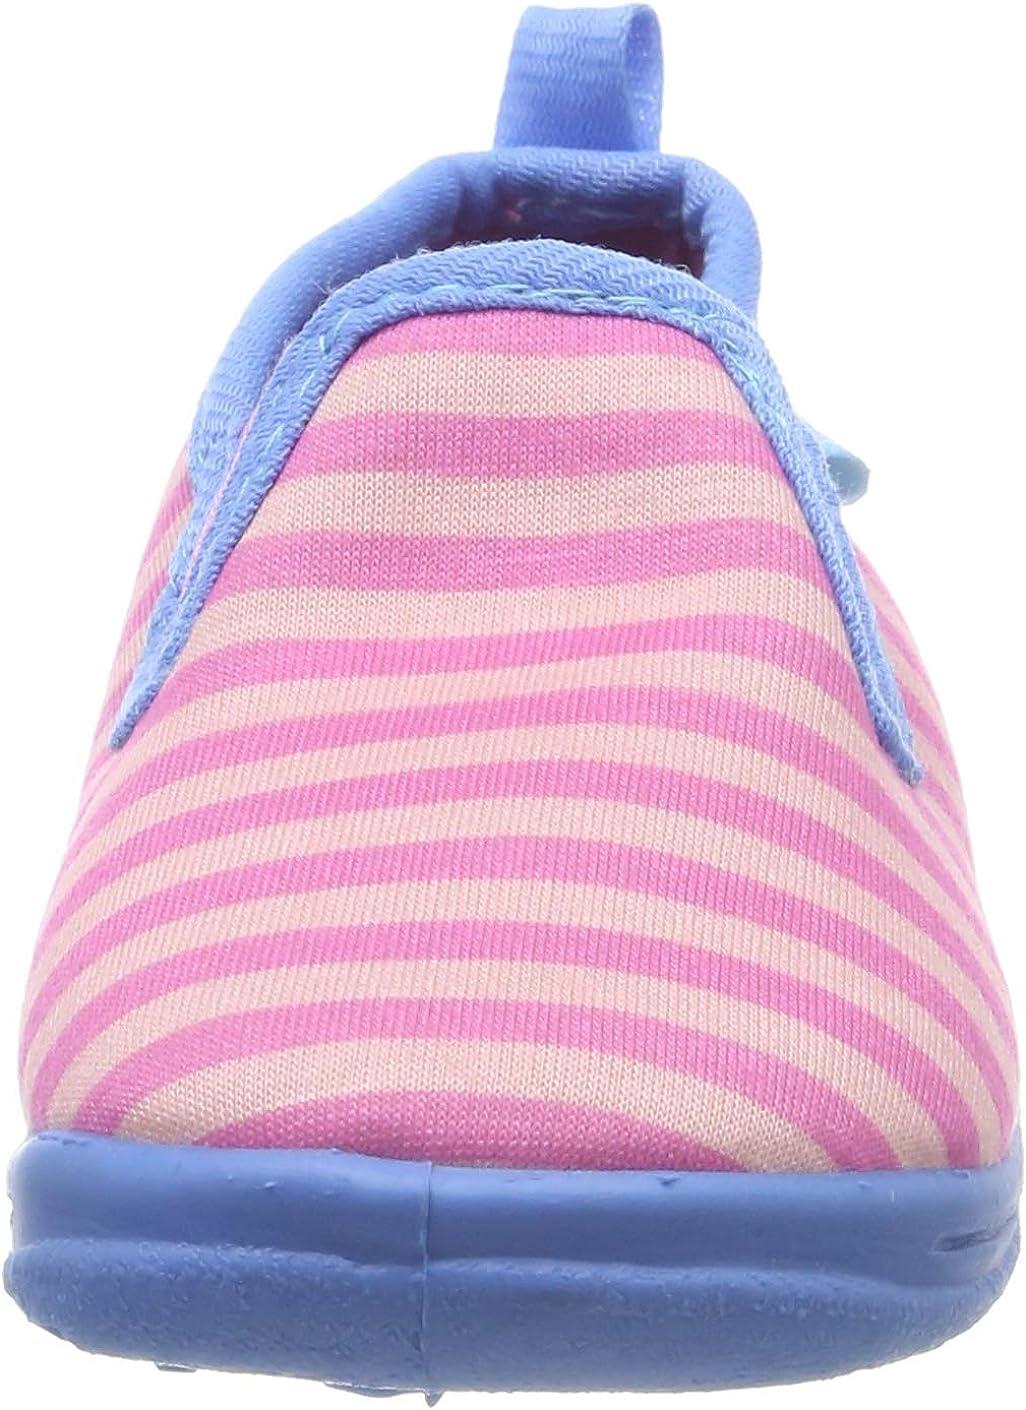 Playshoes Ciabatte/ Pantofole Bambina Strisce